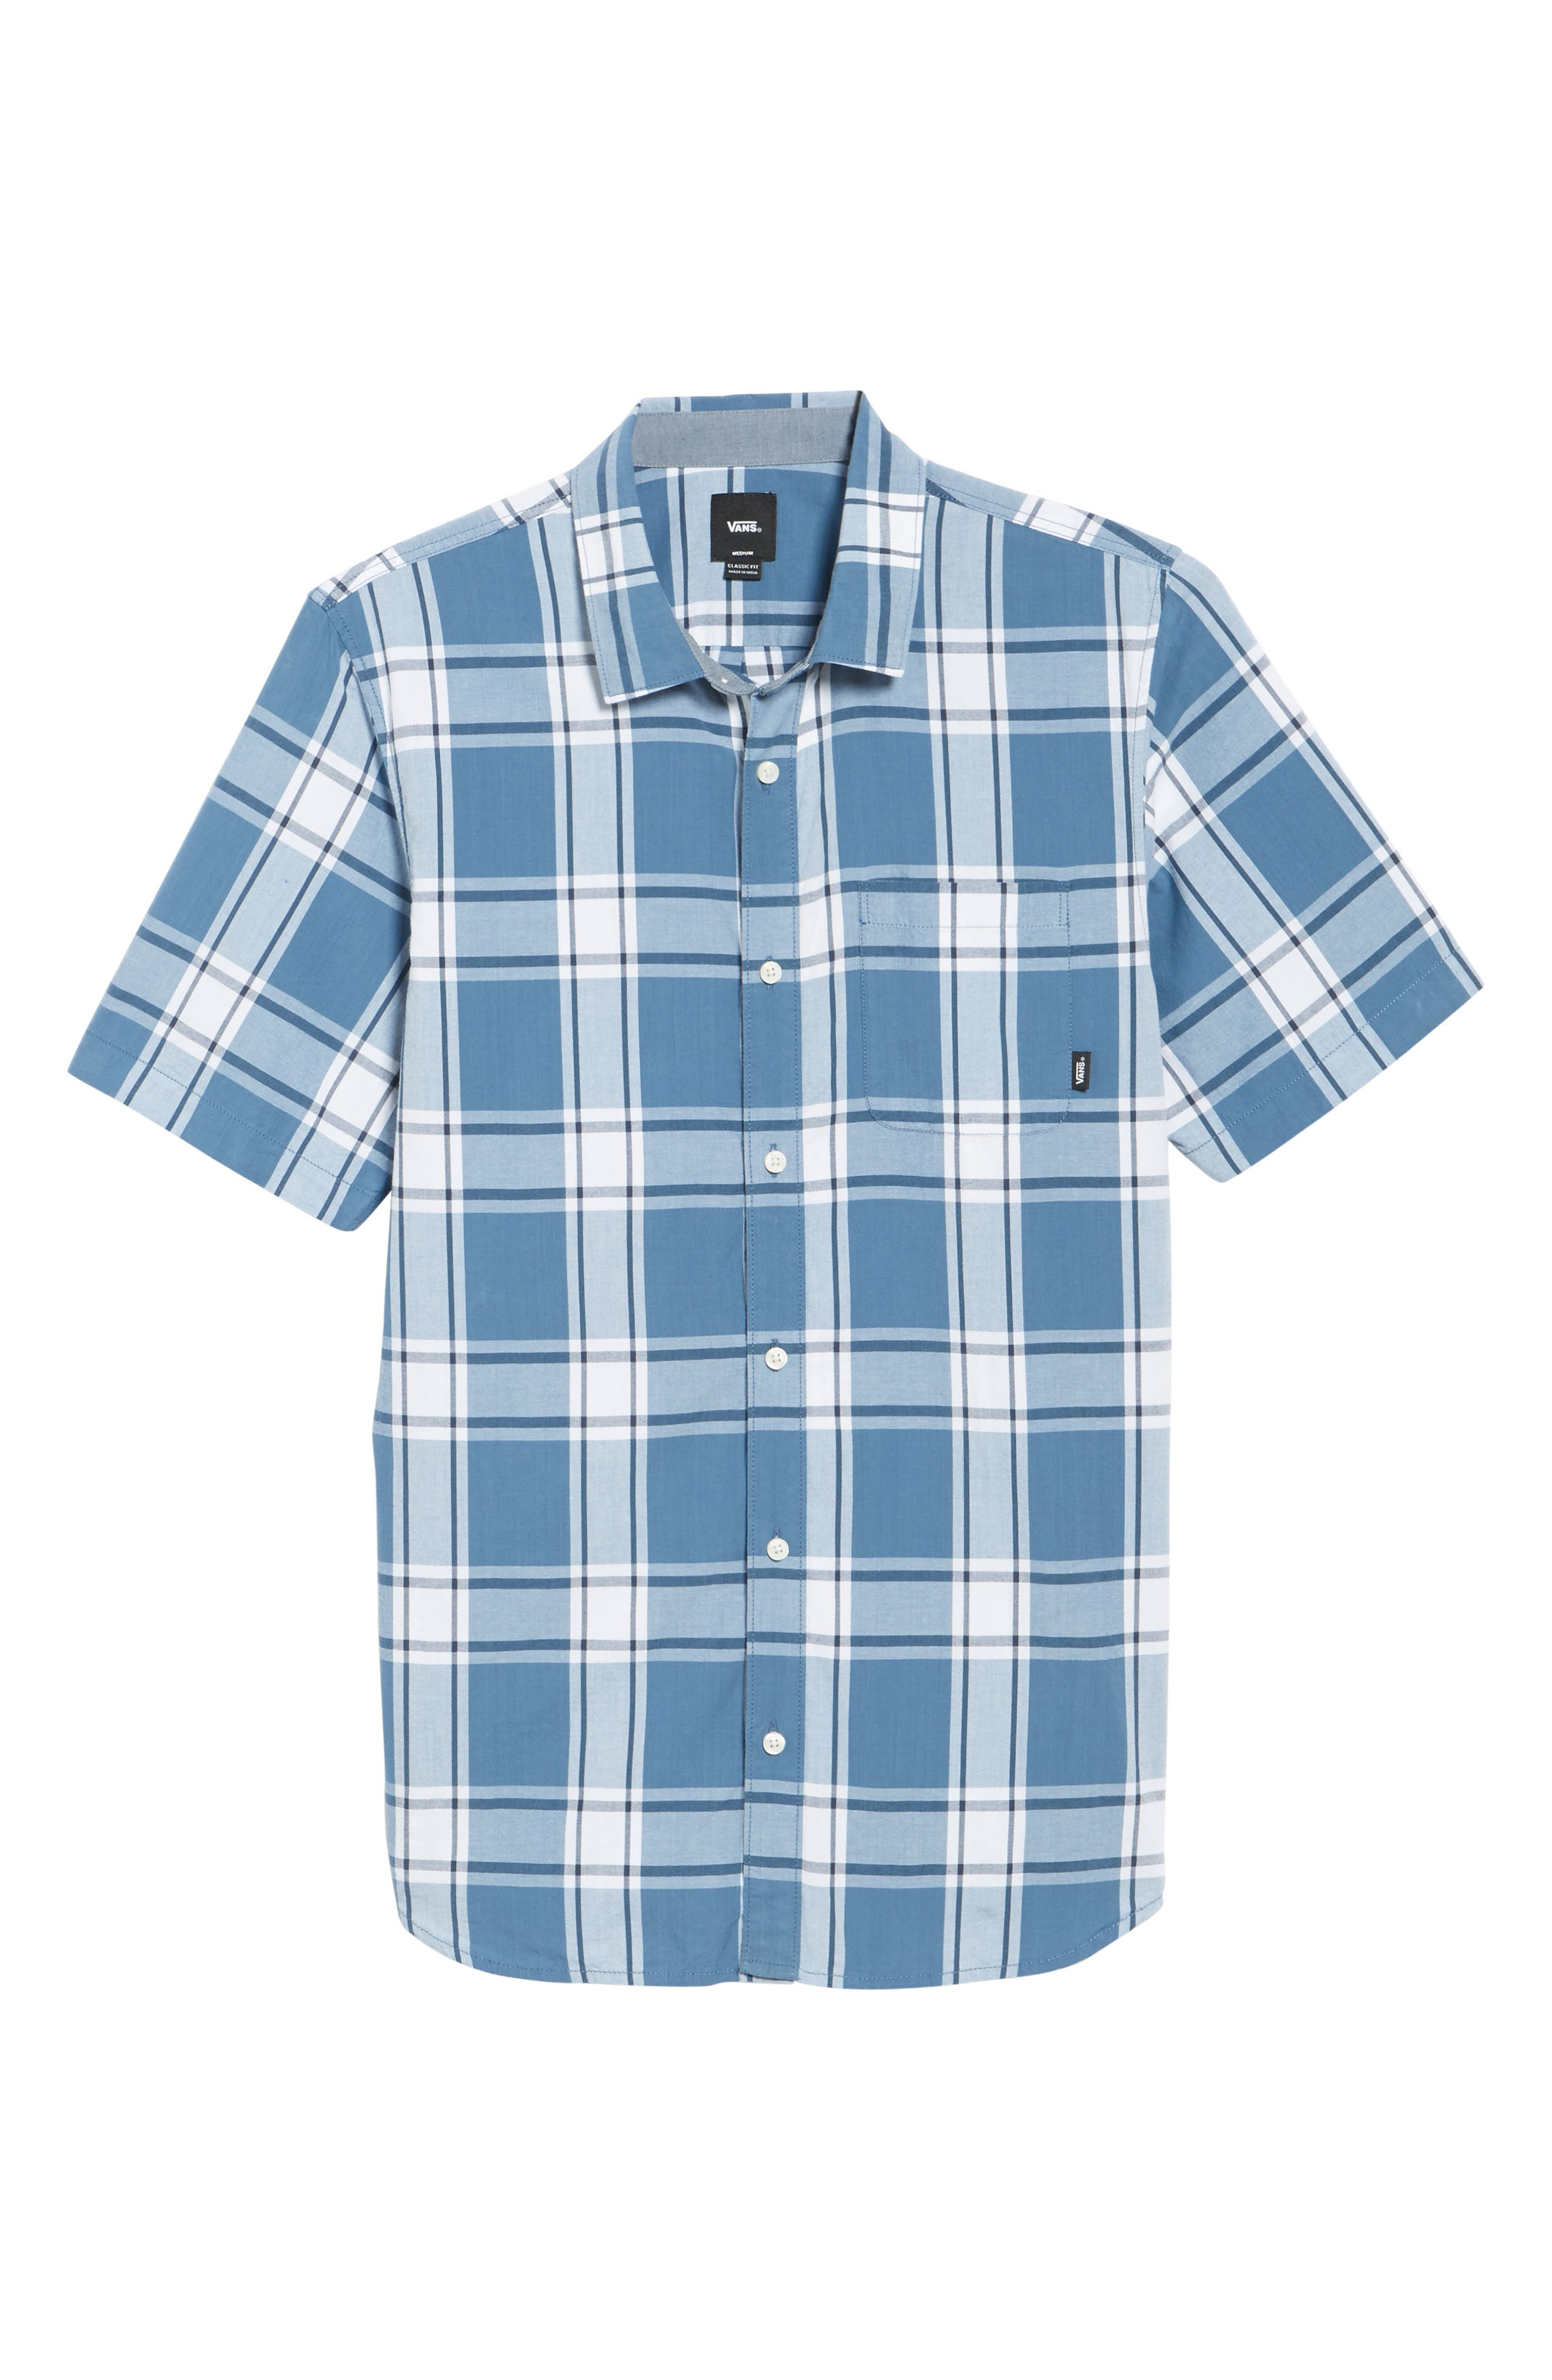 Mayfield Short Sleeve Plaid Shirt,                             Alternate thumbnail 6, color,                             420